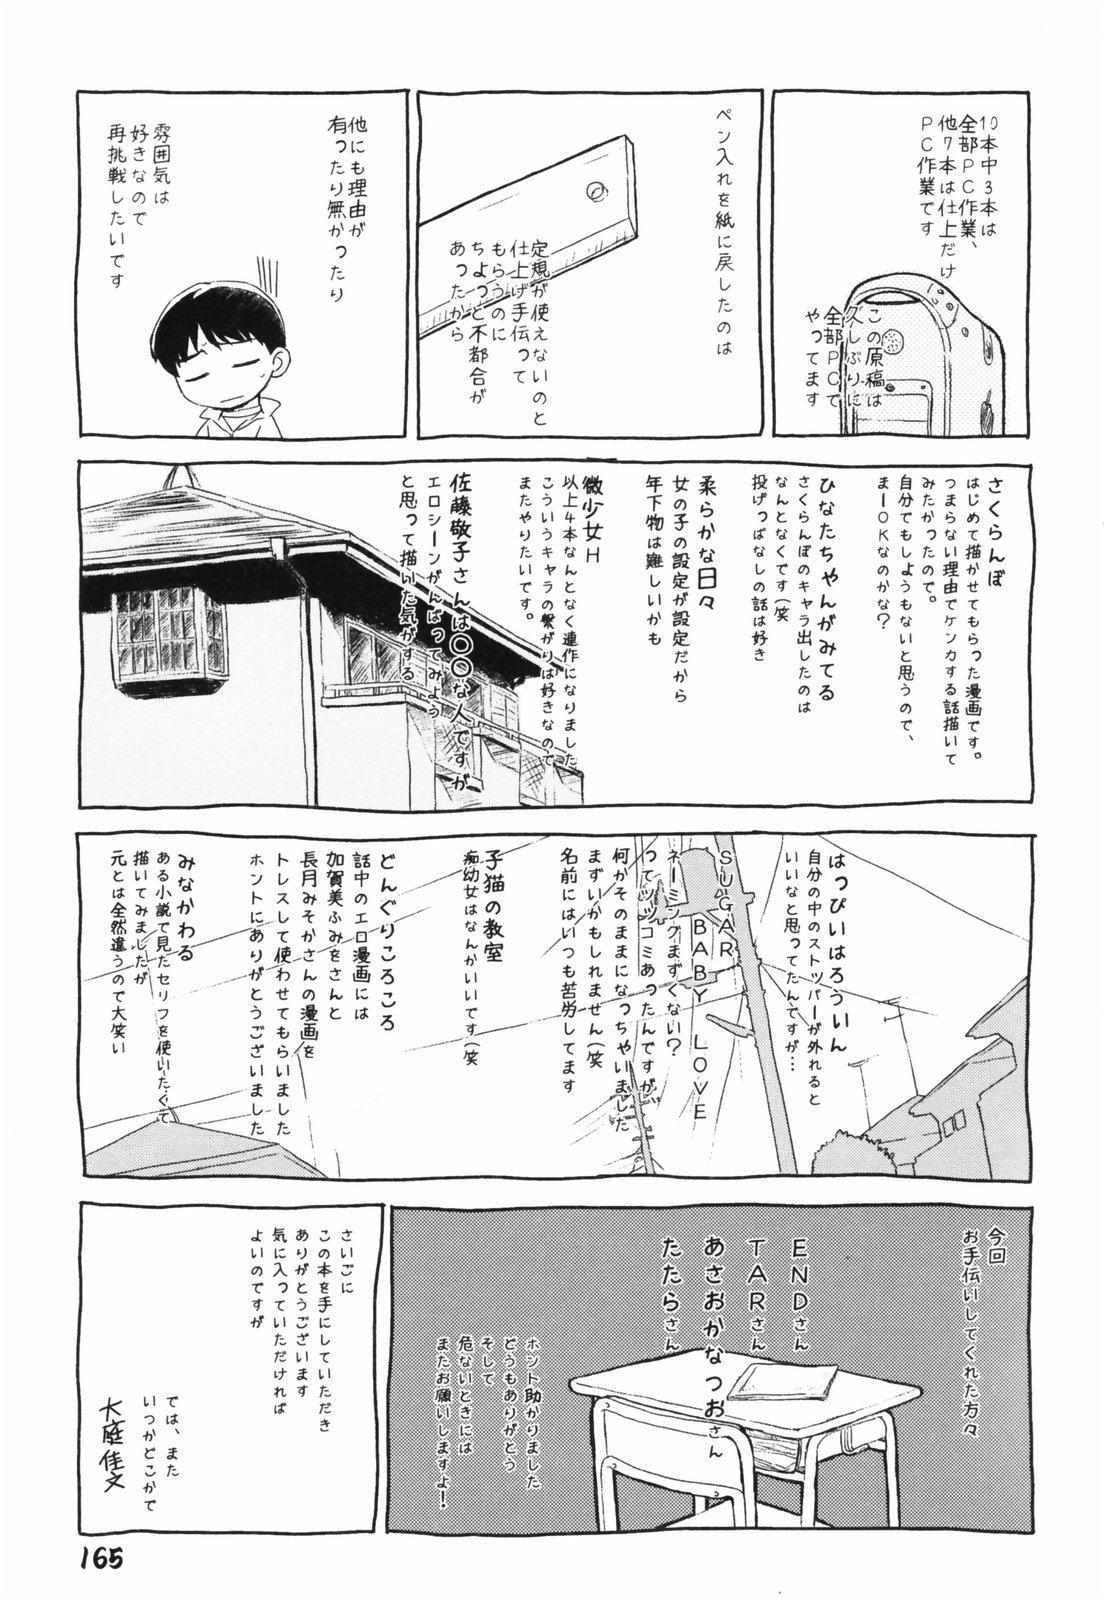 Hanjuku Shoujo 167